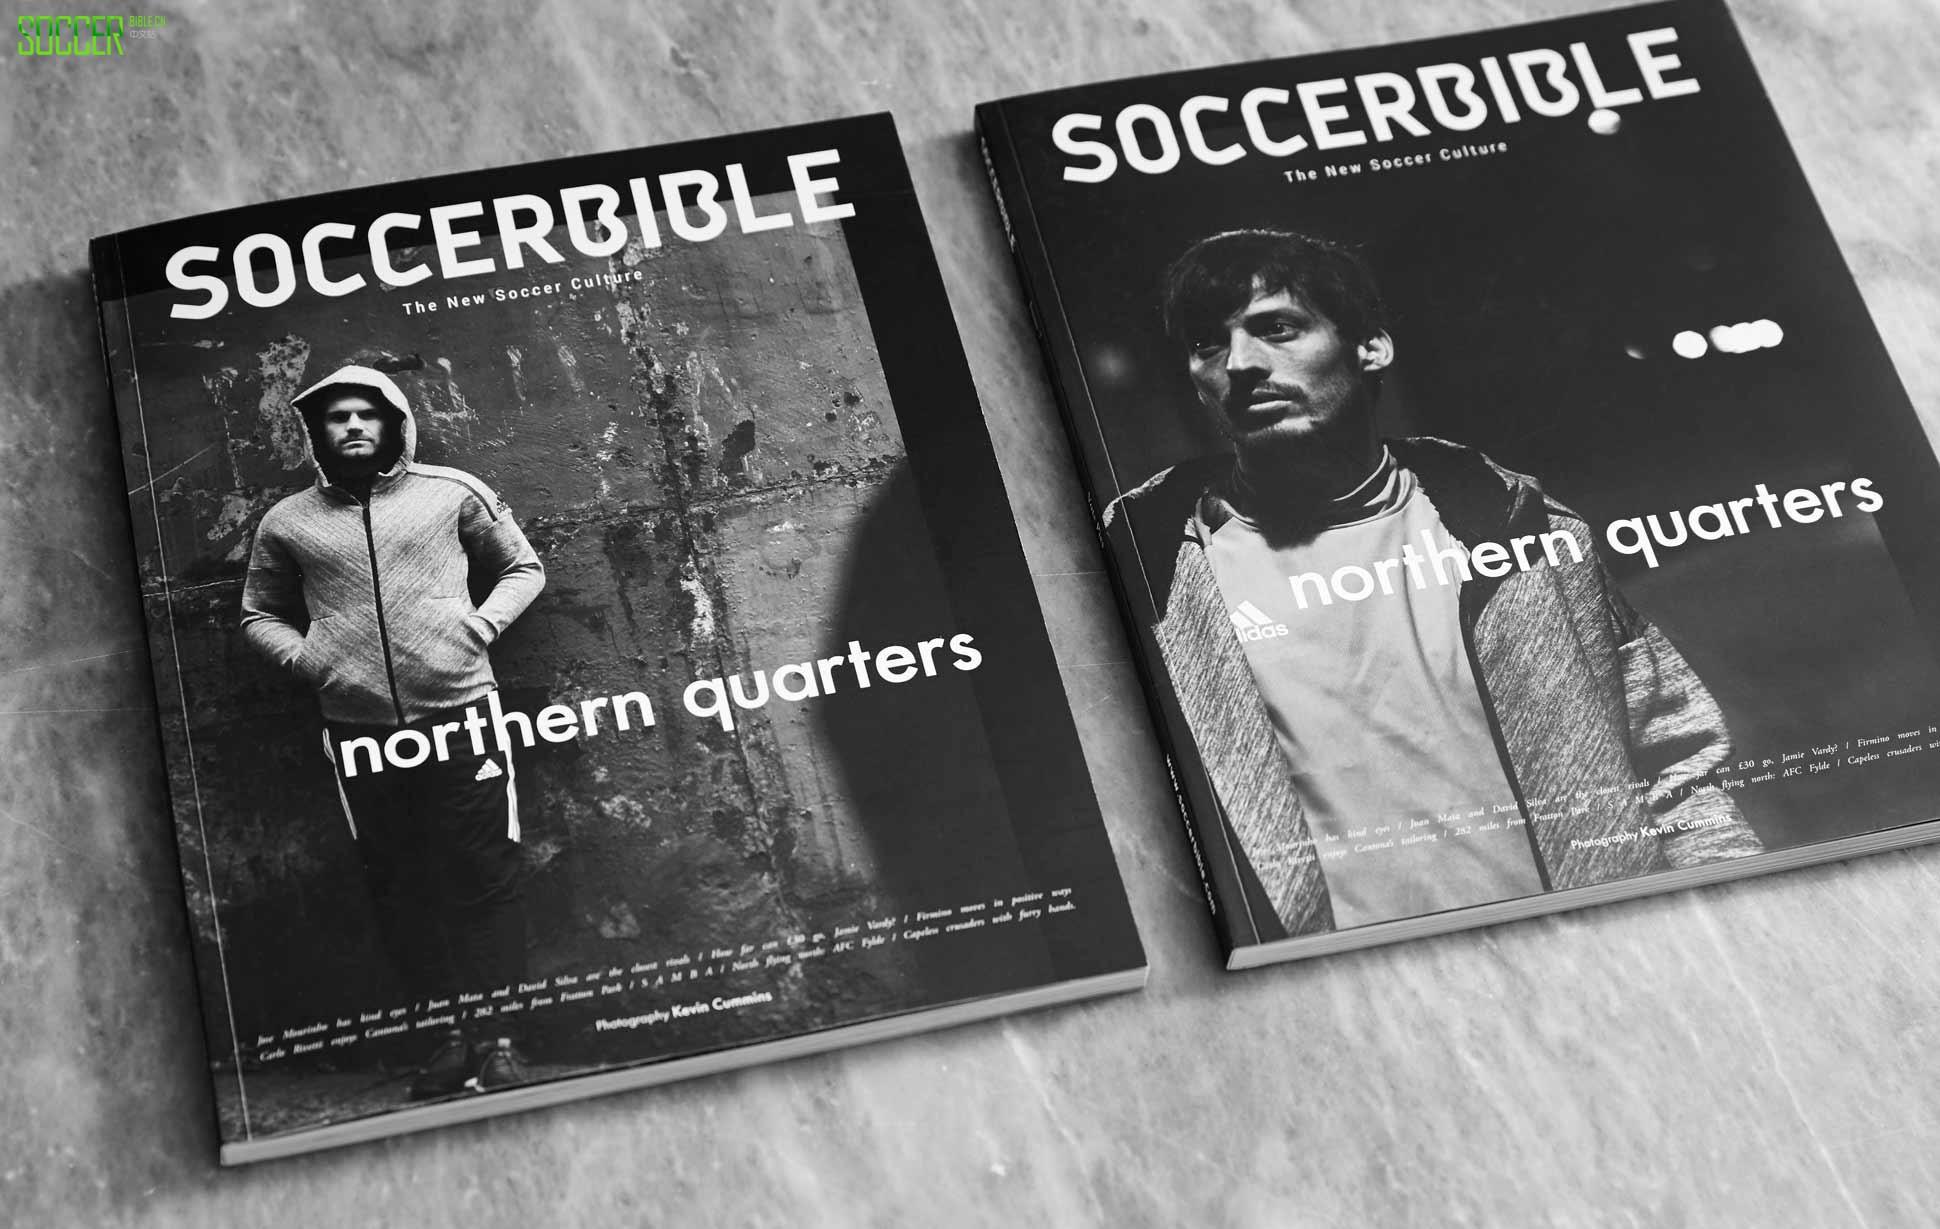 bible 足球鞋 soccer